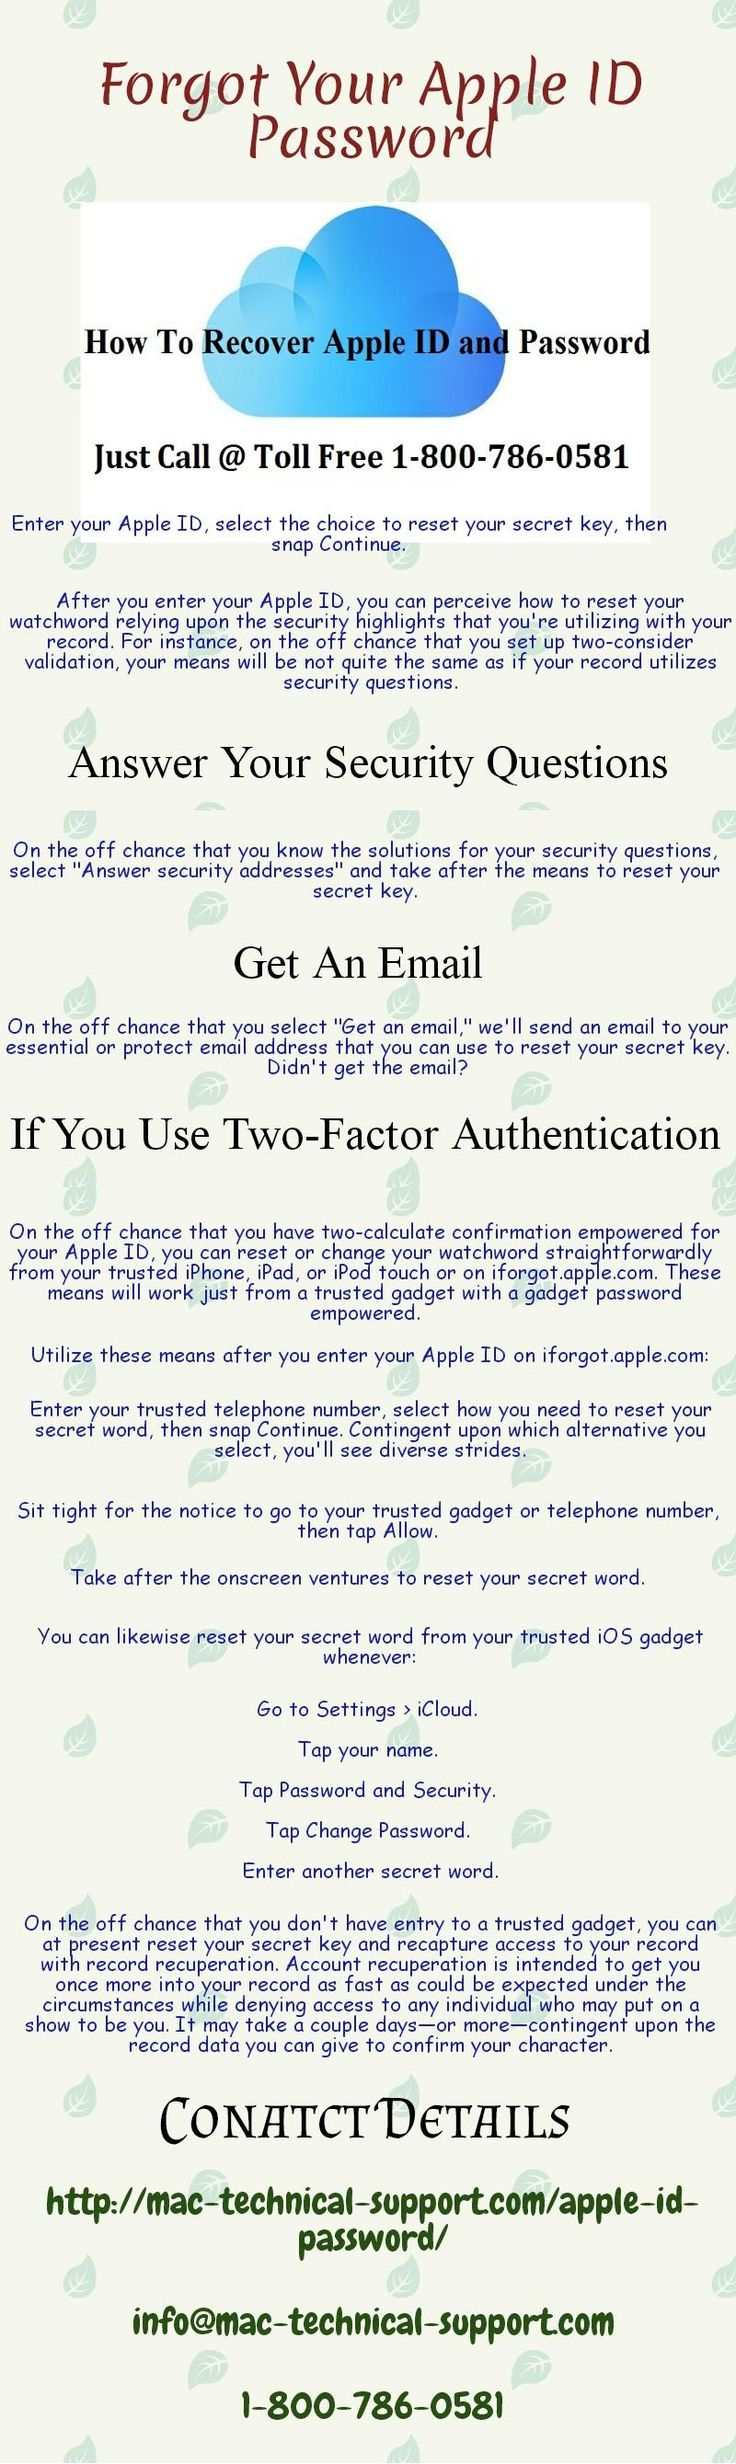 https://magic.piktochart.com/output/17377127-forgot-your-apple-id-password